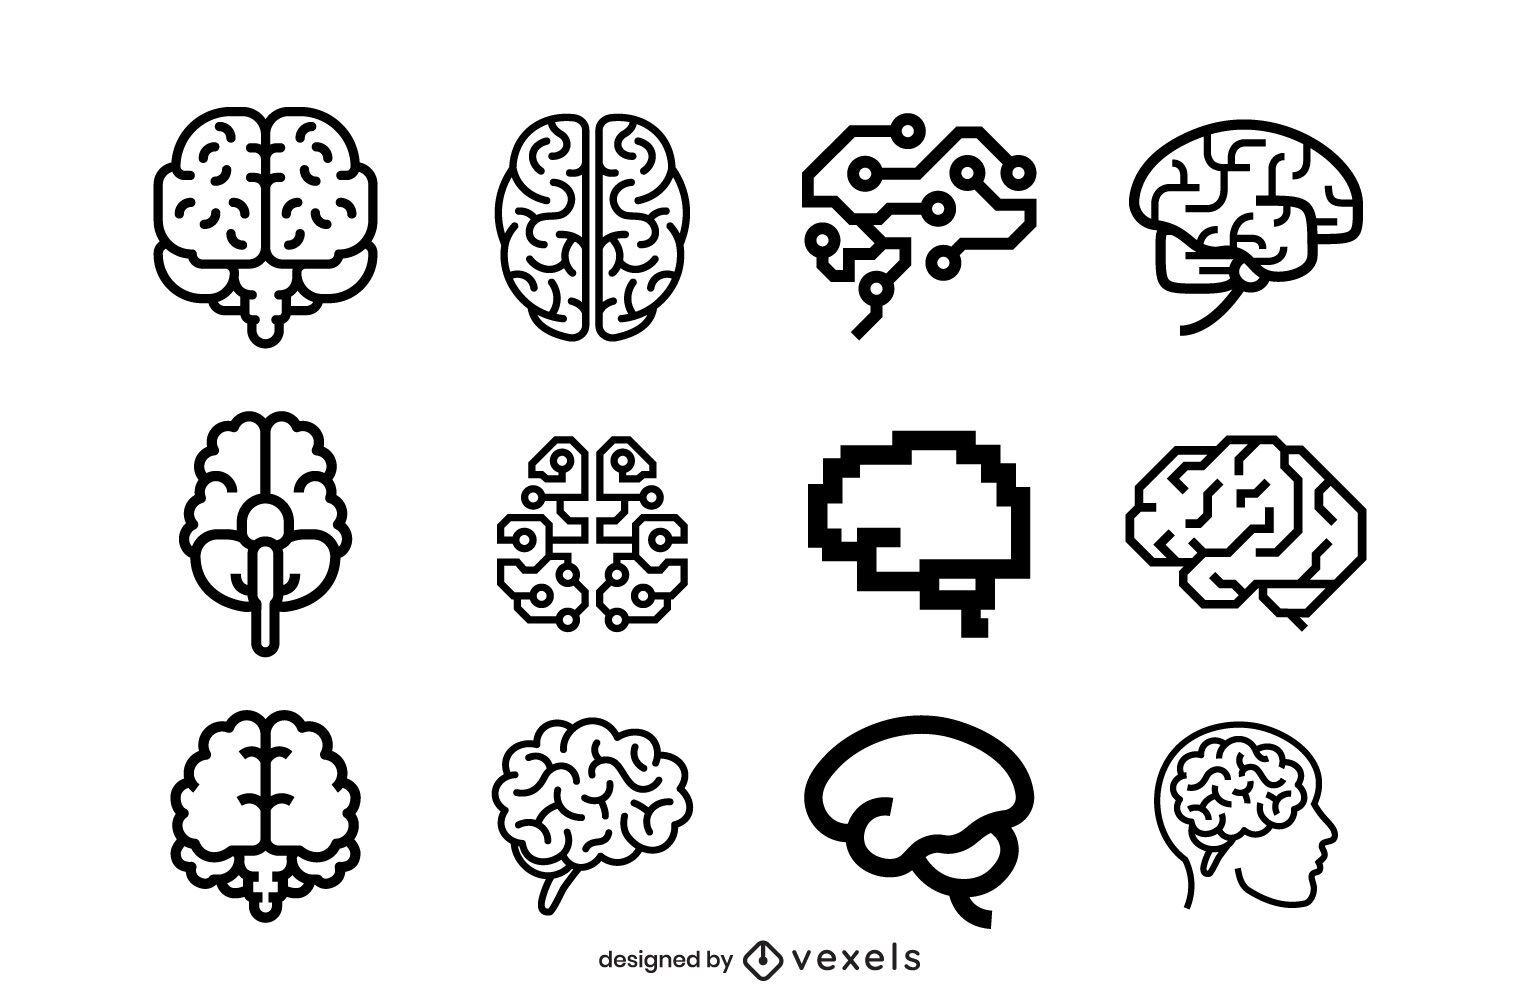 Conjunto de ícones do cérebro